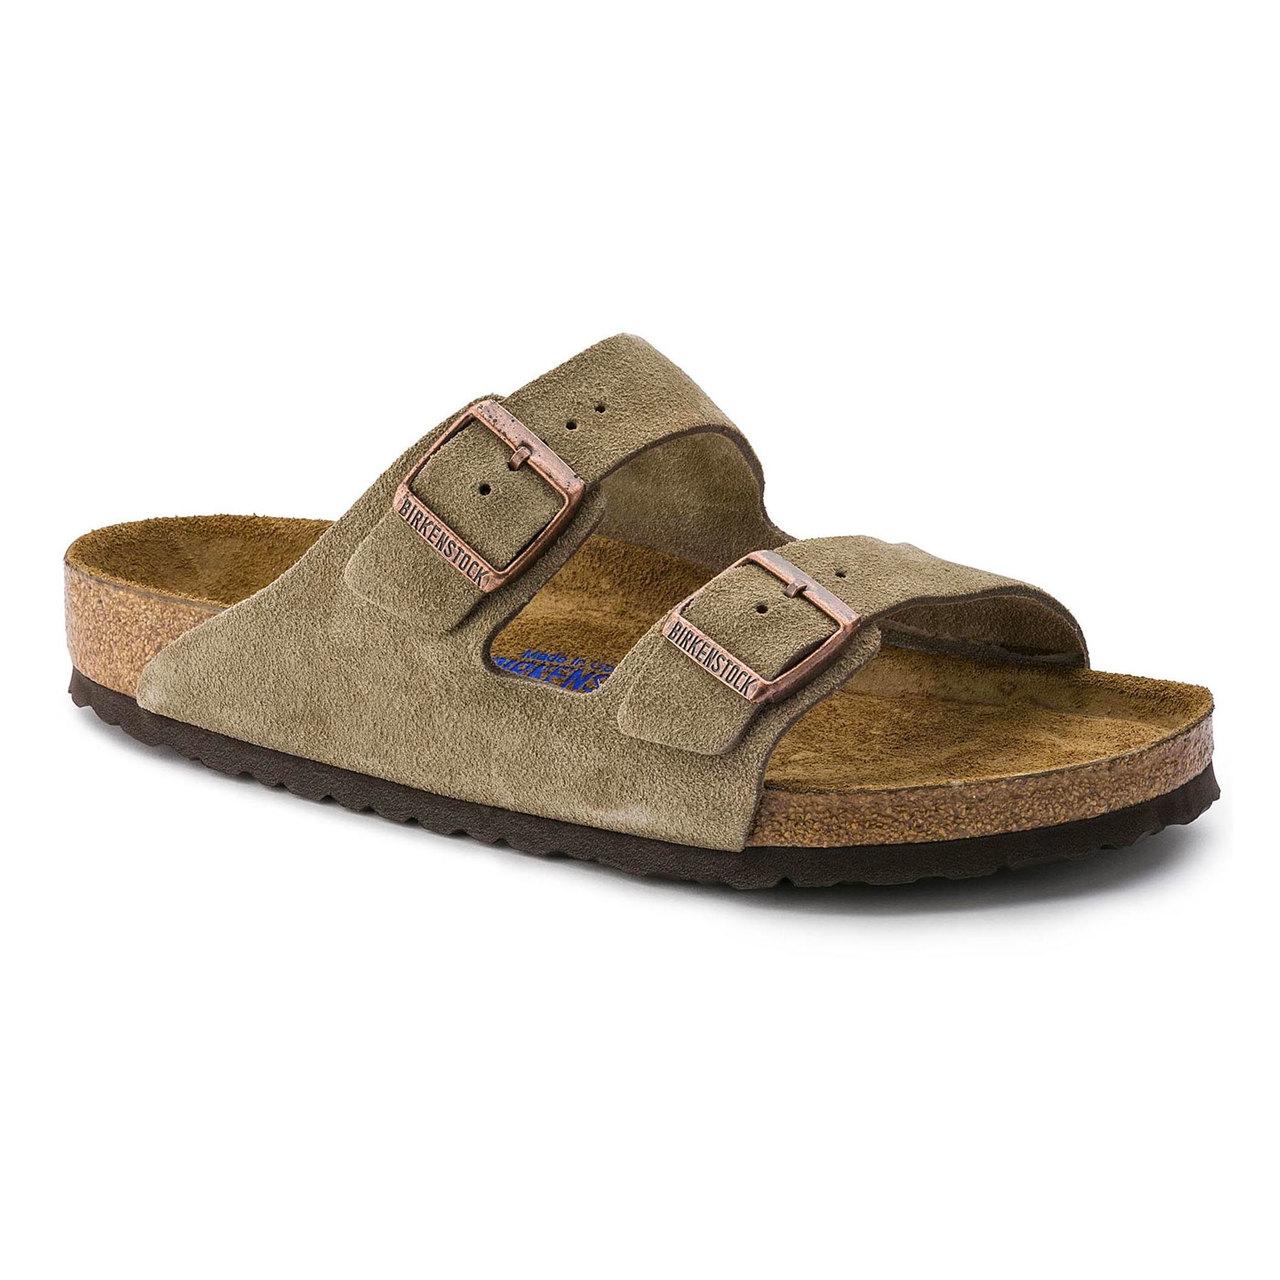 8e412c88d Birkenstock Arizona Soft Footbed - Taupe Suede (Regular Width)